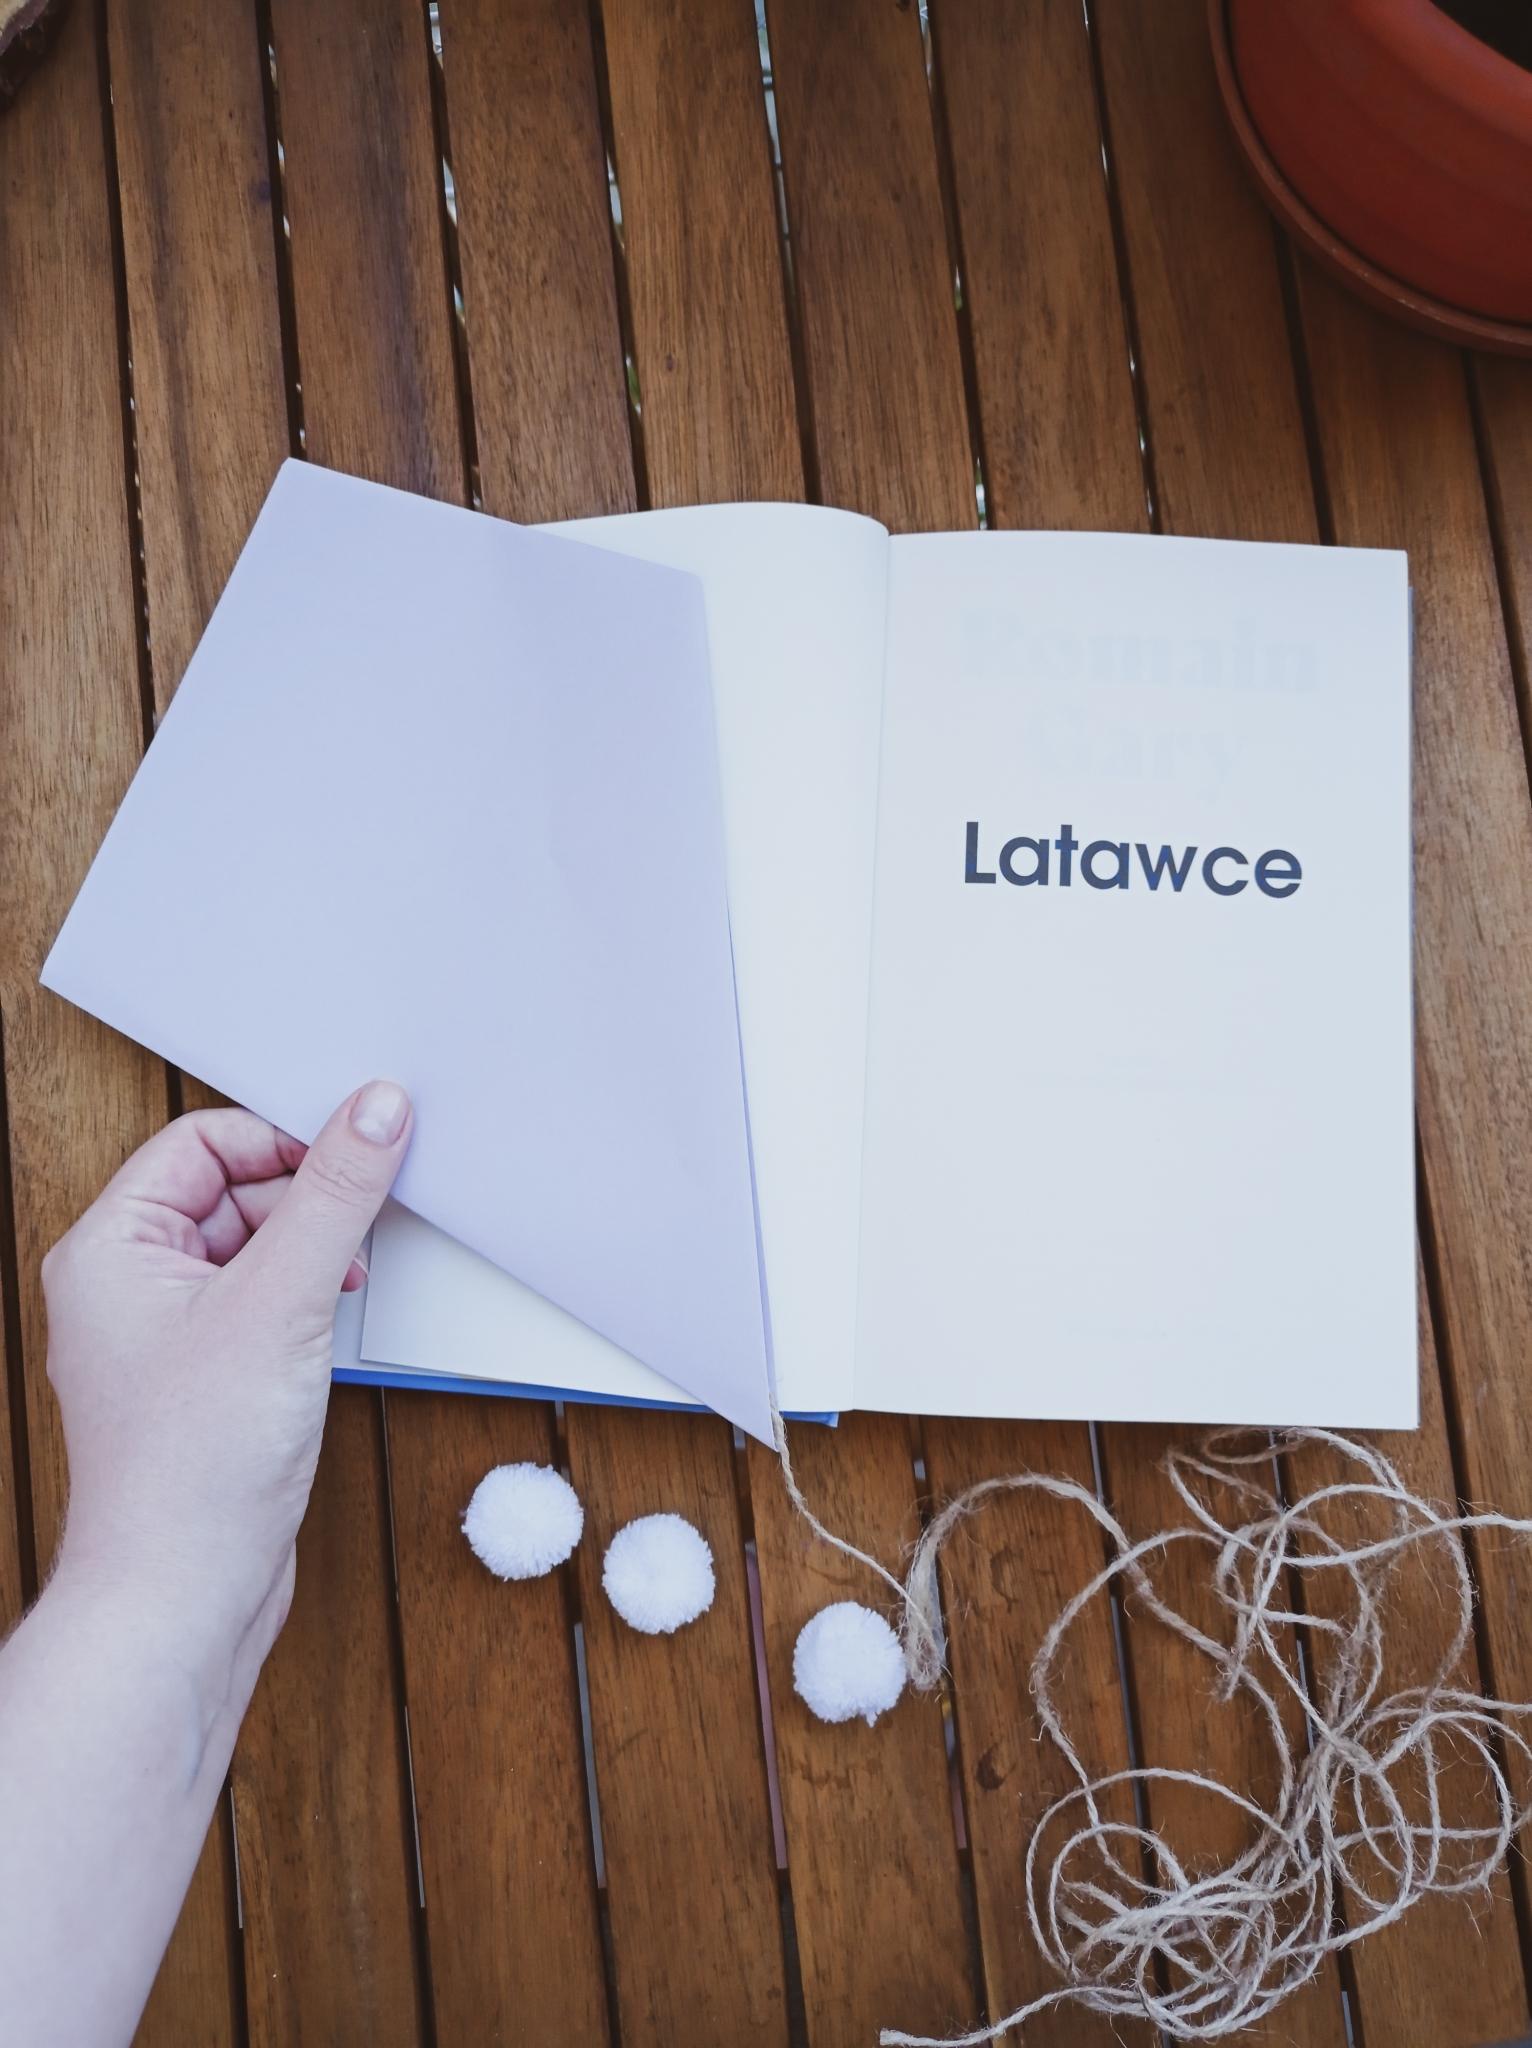 Latawce Romain Gary